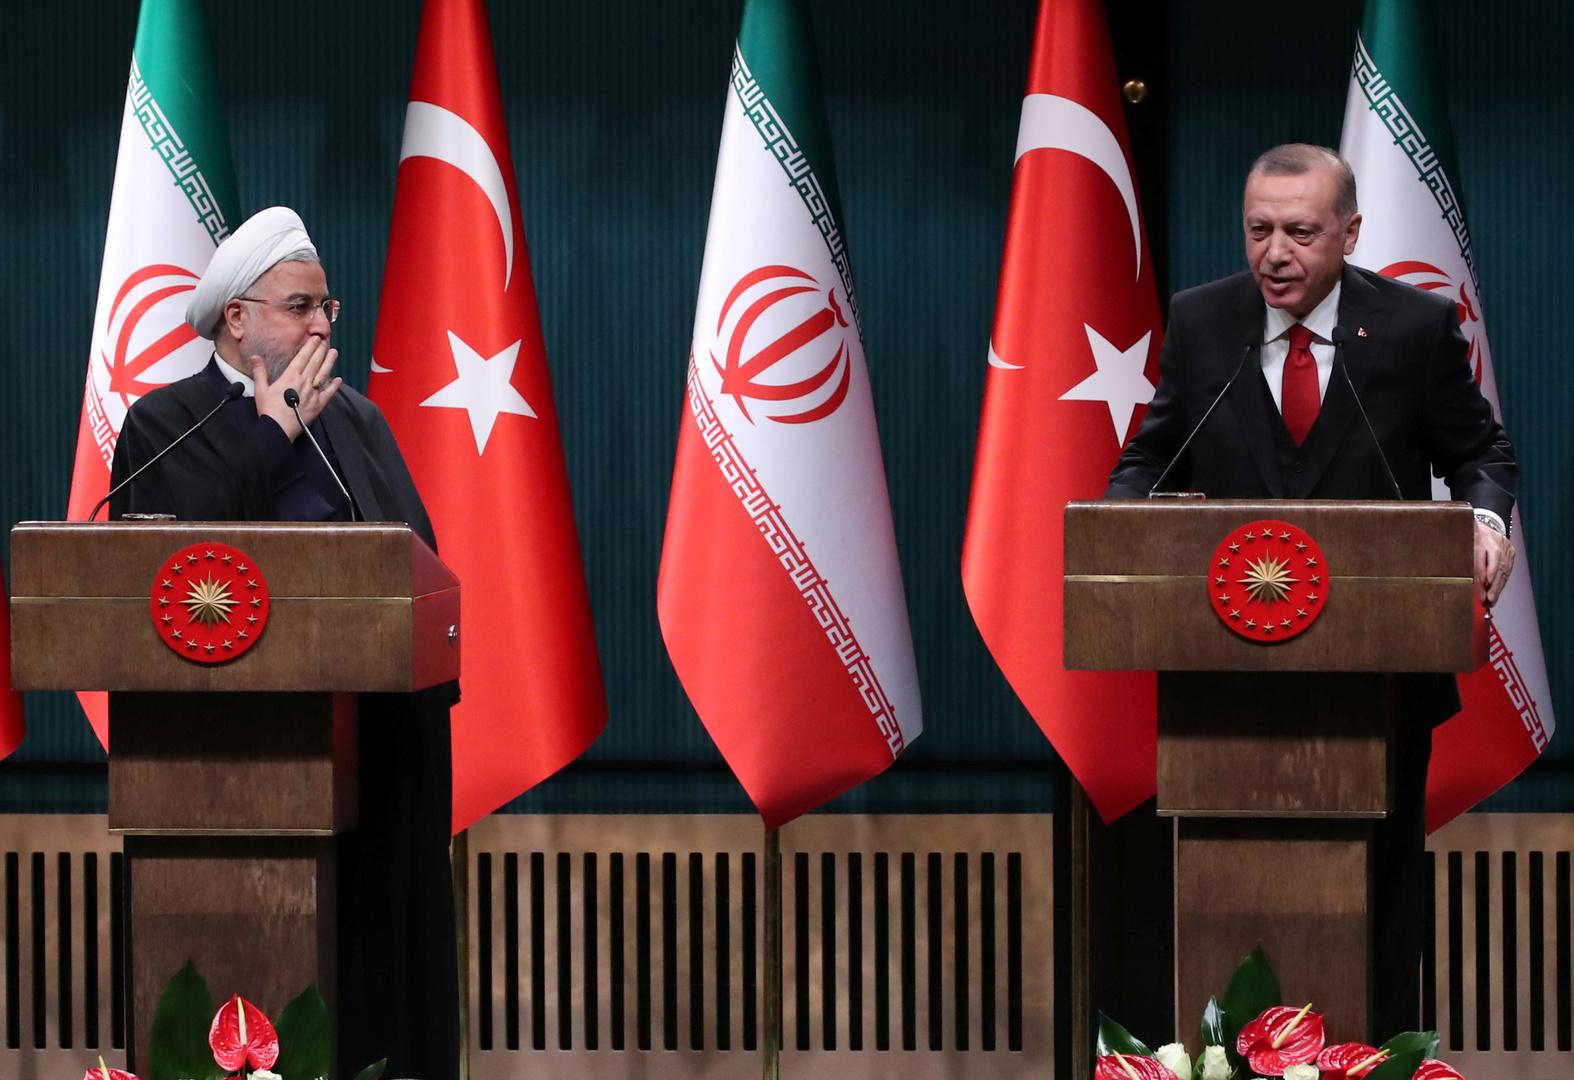 سوف يحصرون إيران في ممر ضيق للغاز